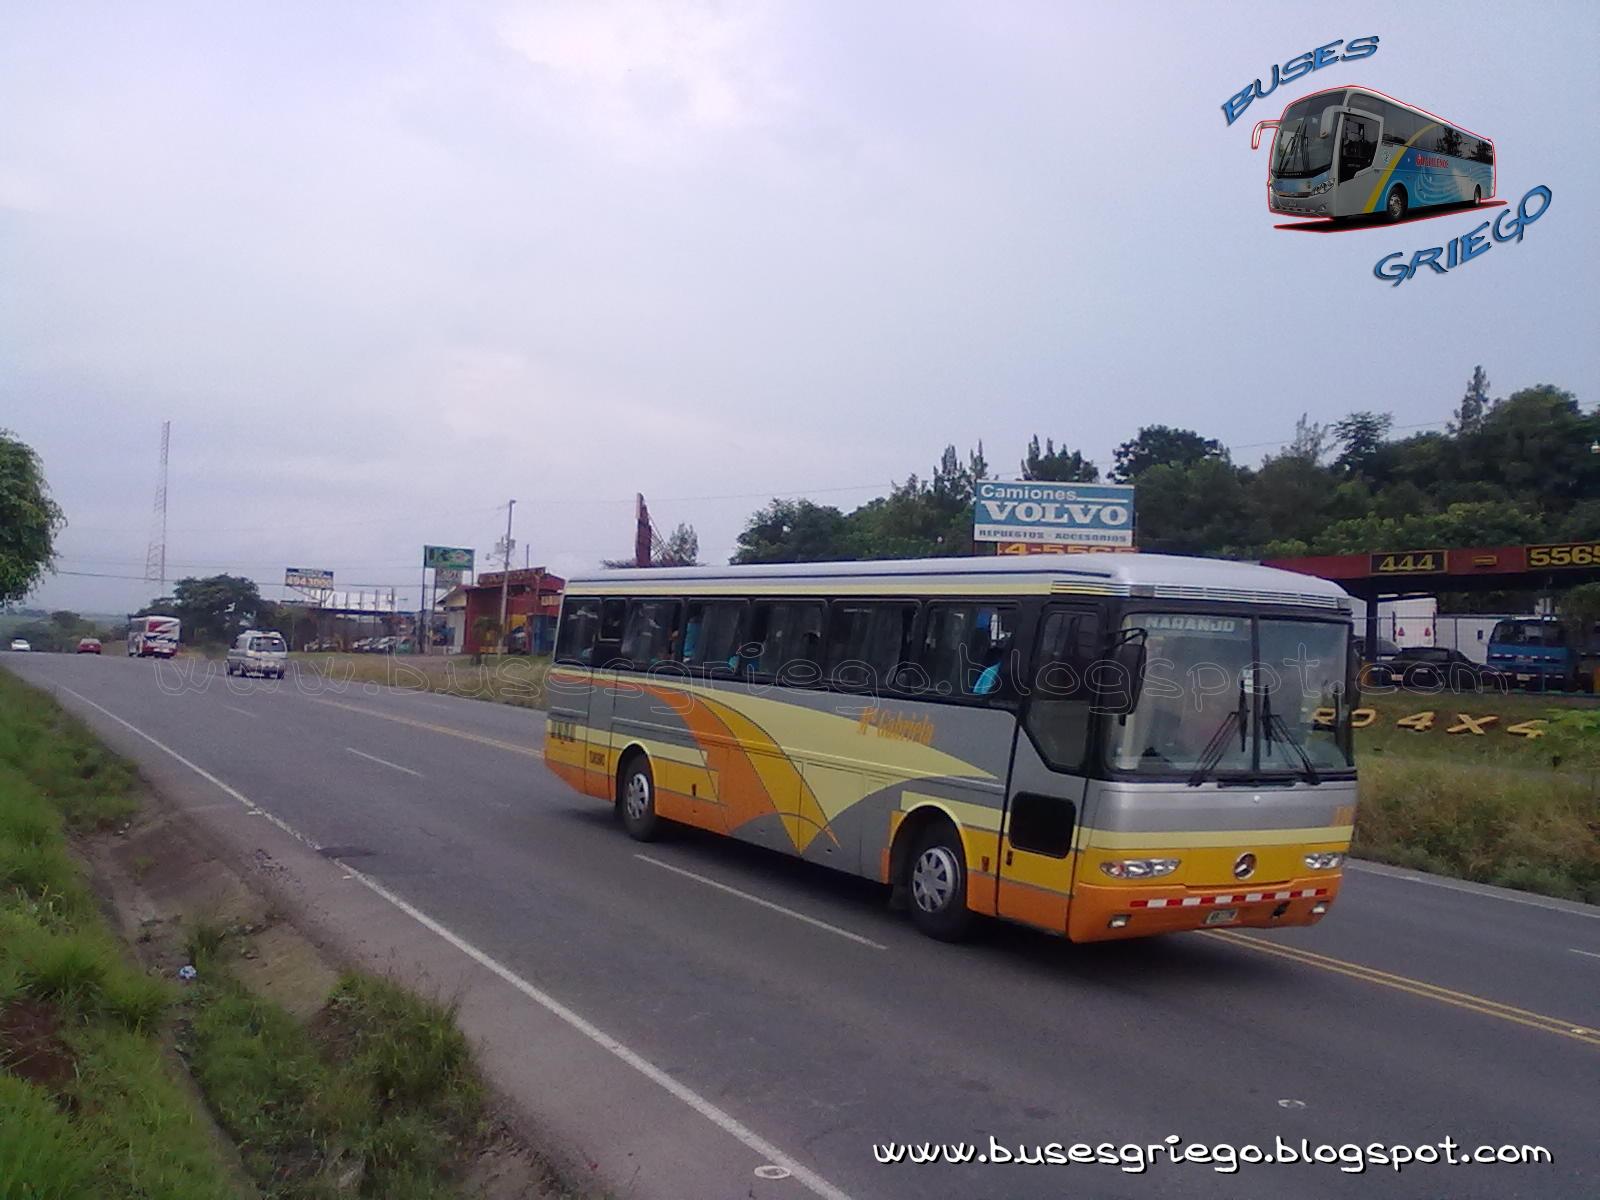 Buses griego especial mercedes benz monoblocos for Mercedes benz san jose